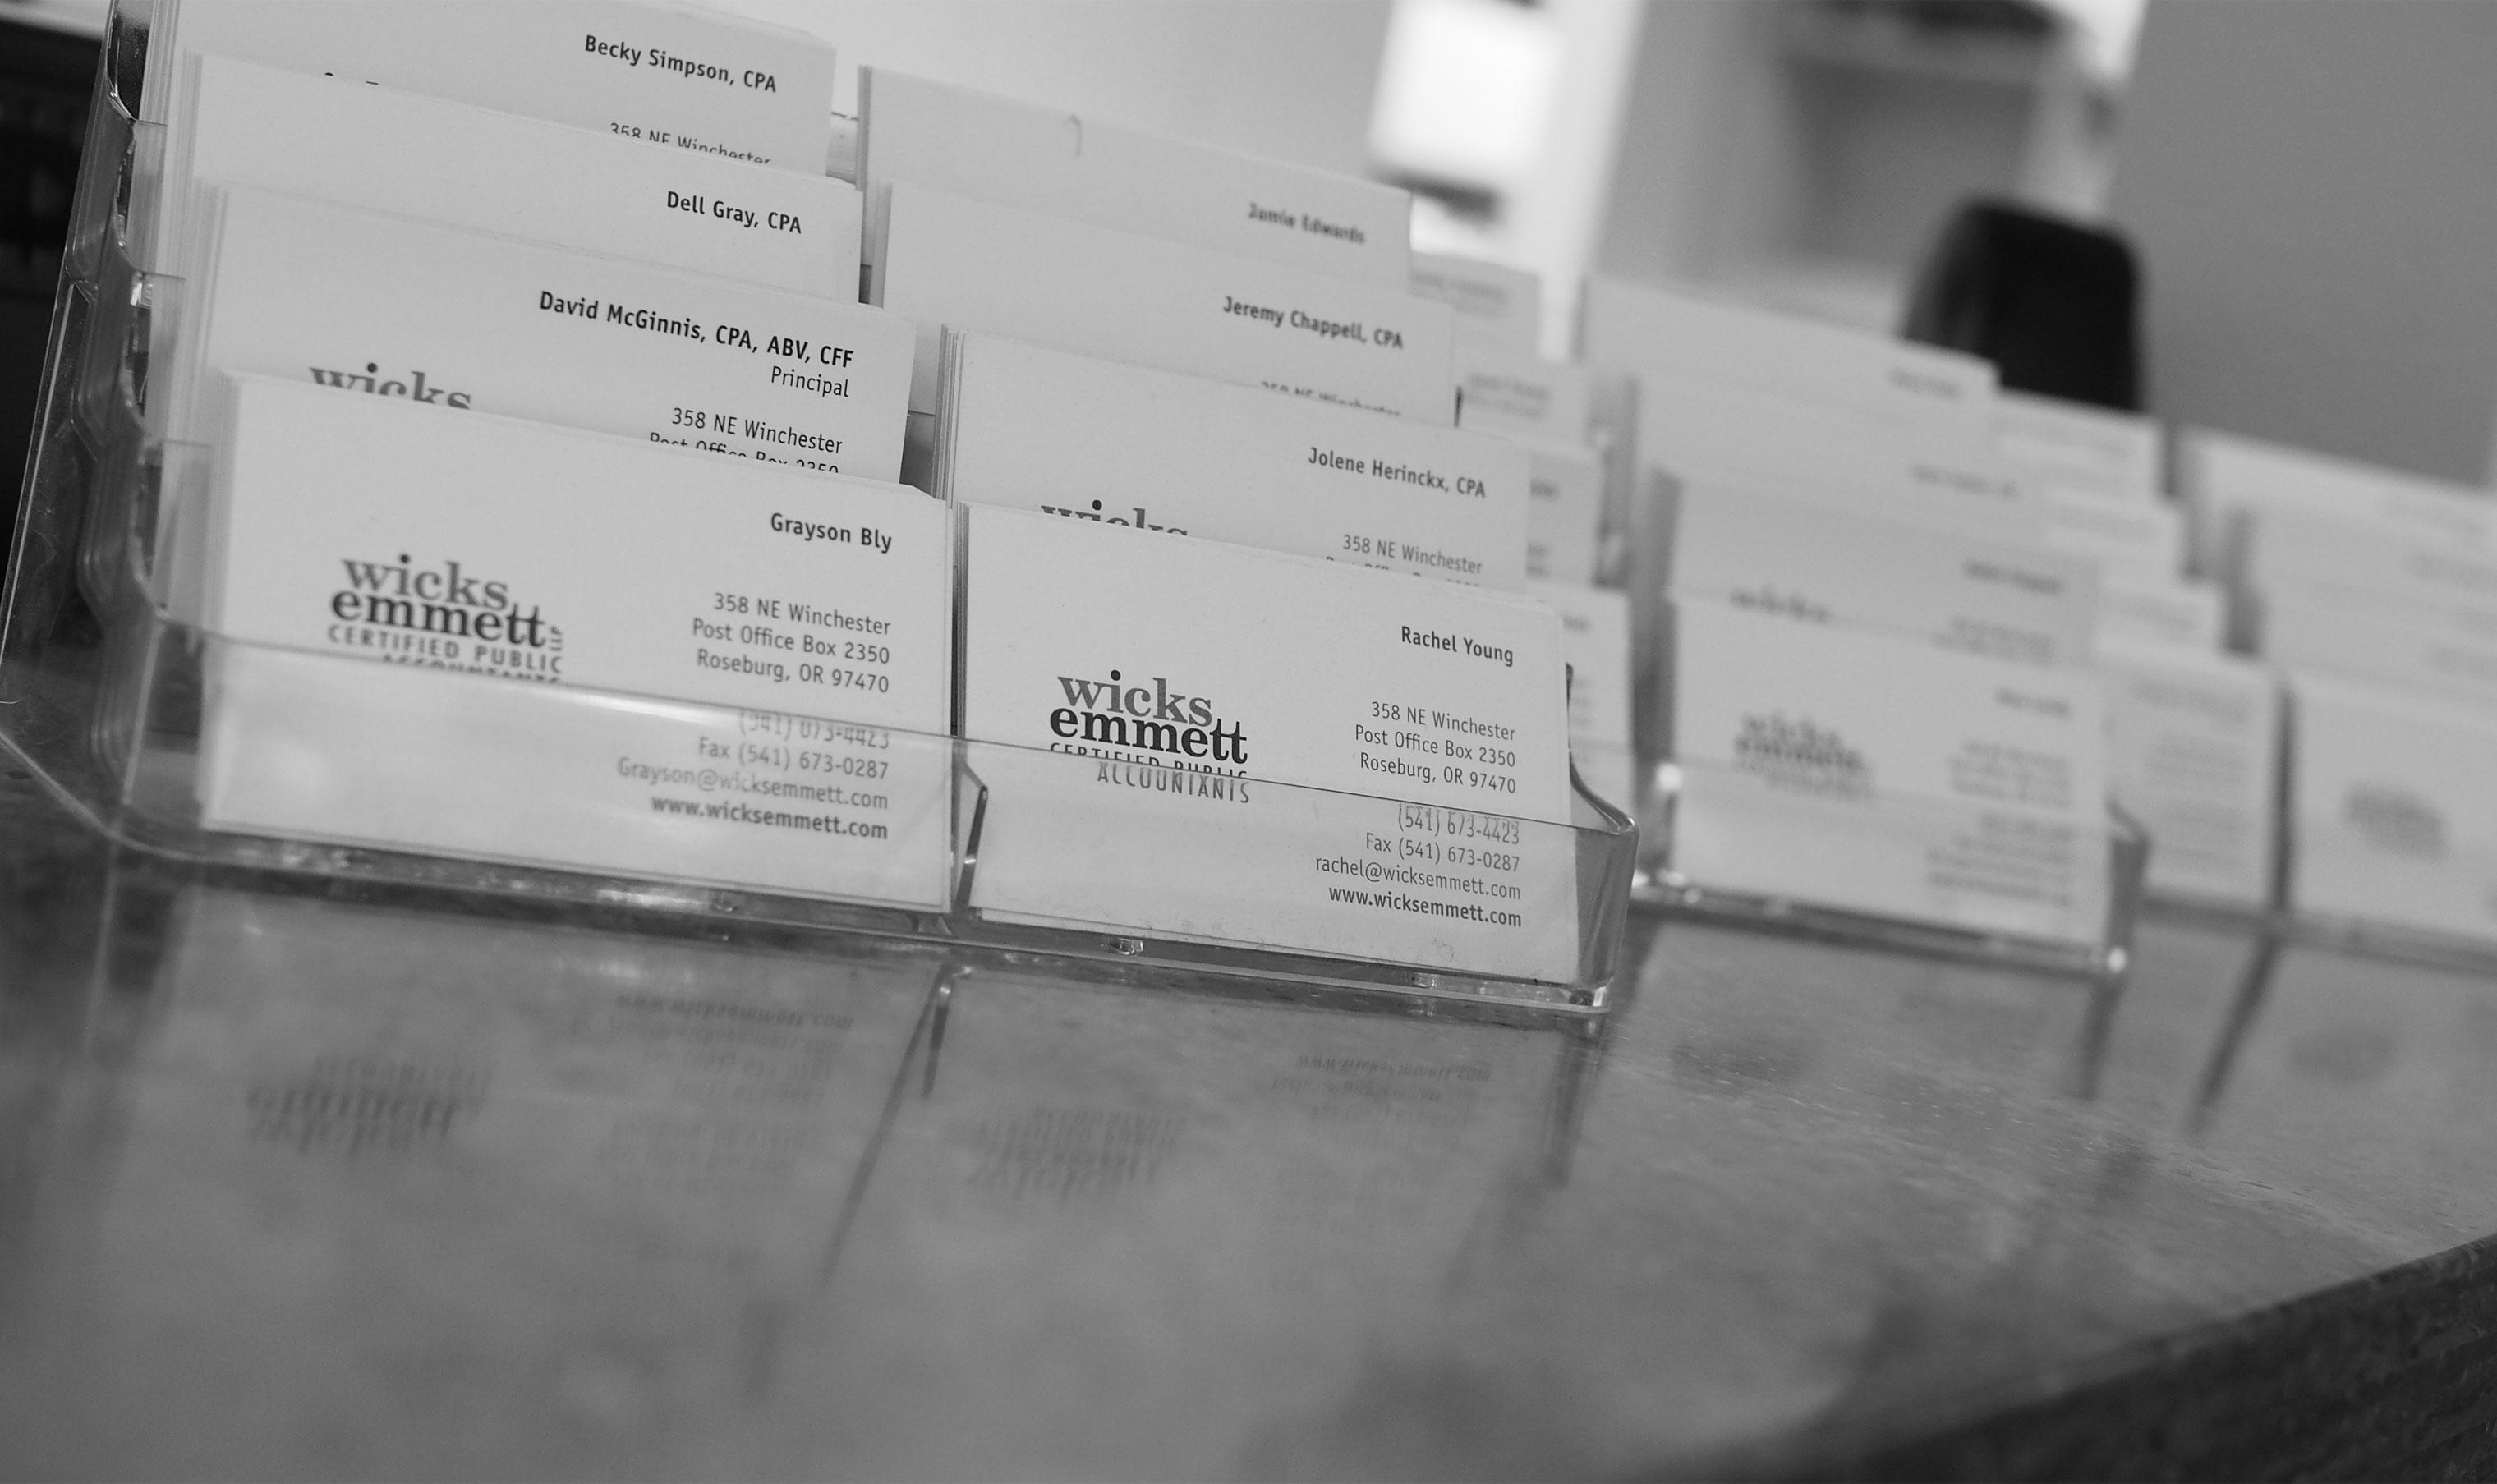 wicks-emmett-business-cards-background | Wicks Emmett CPA Firm